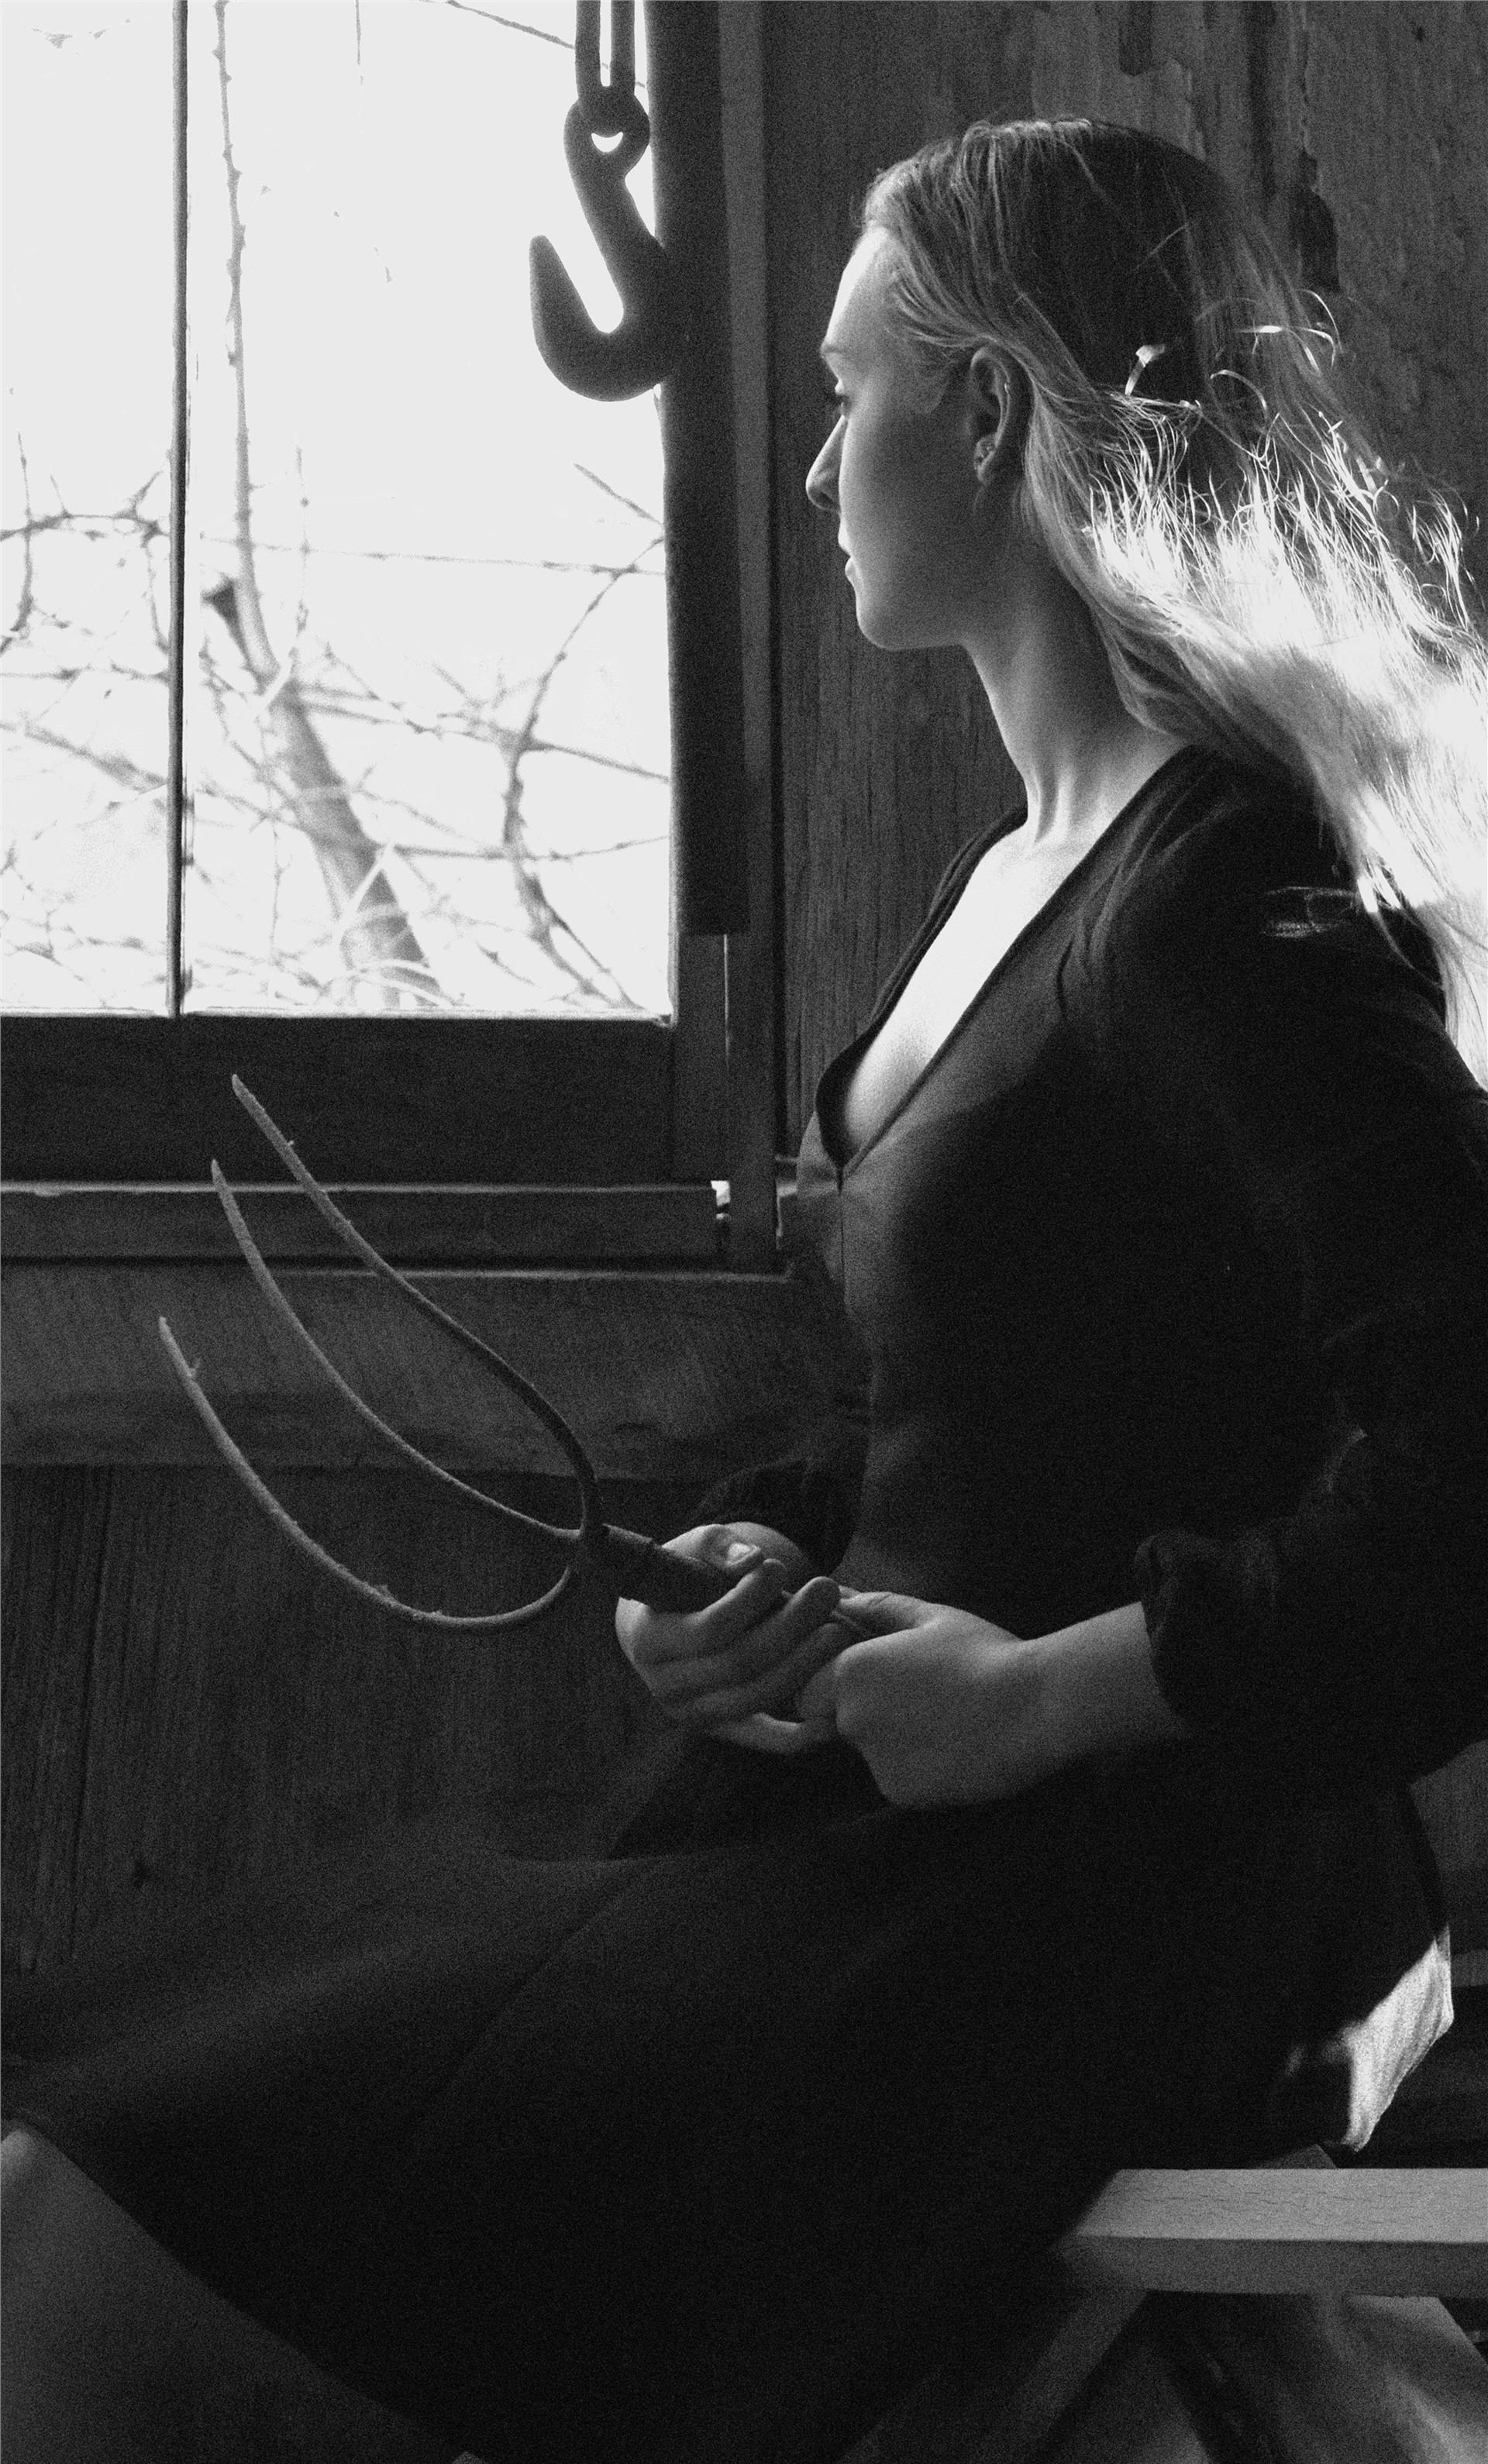 Taylor Bock, The Wait, 2016